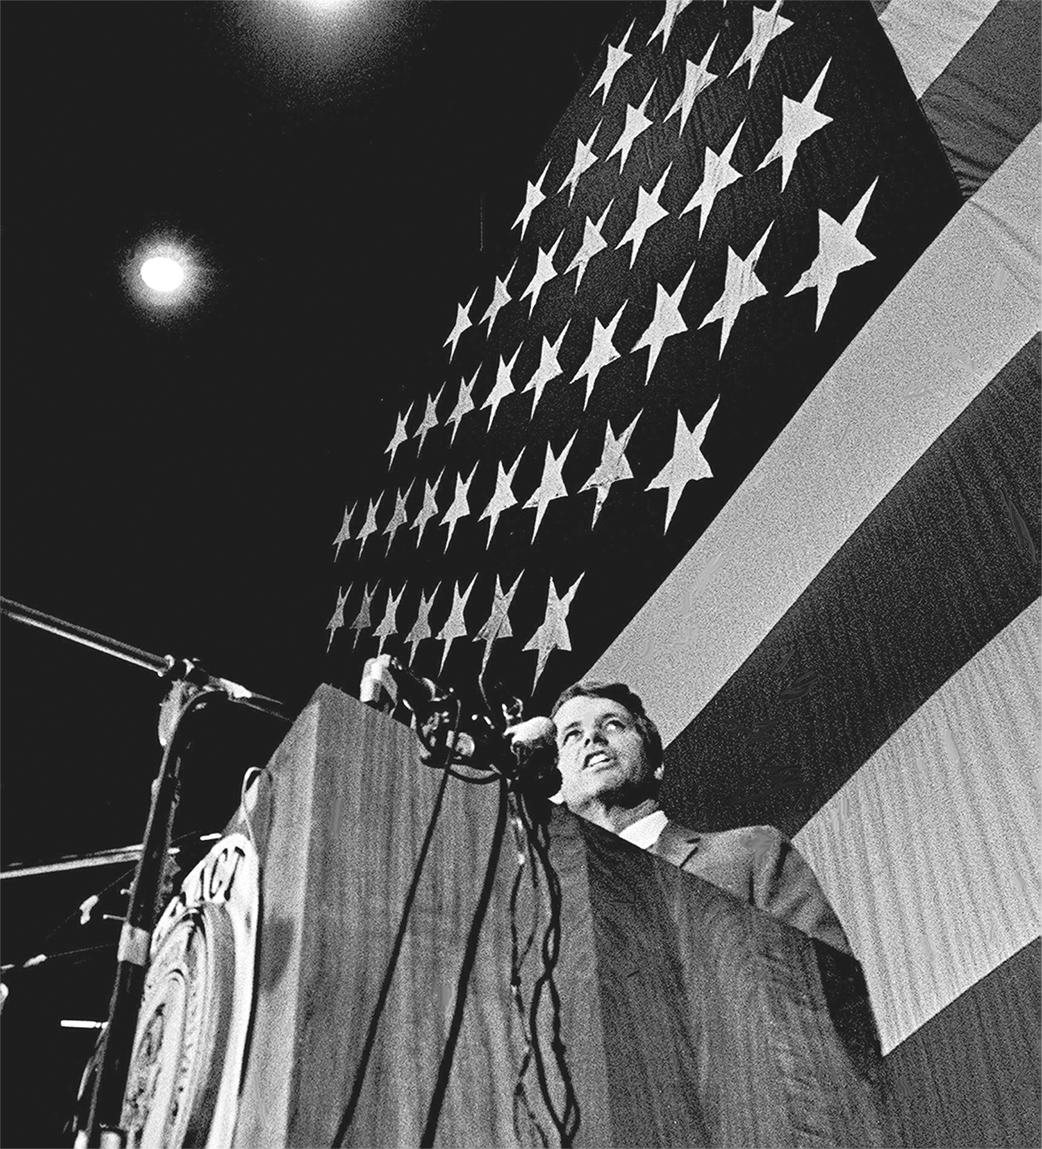 photo of Robert Kennedy at a podium